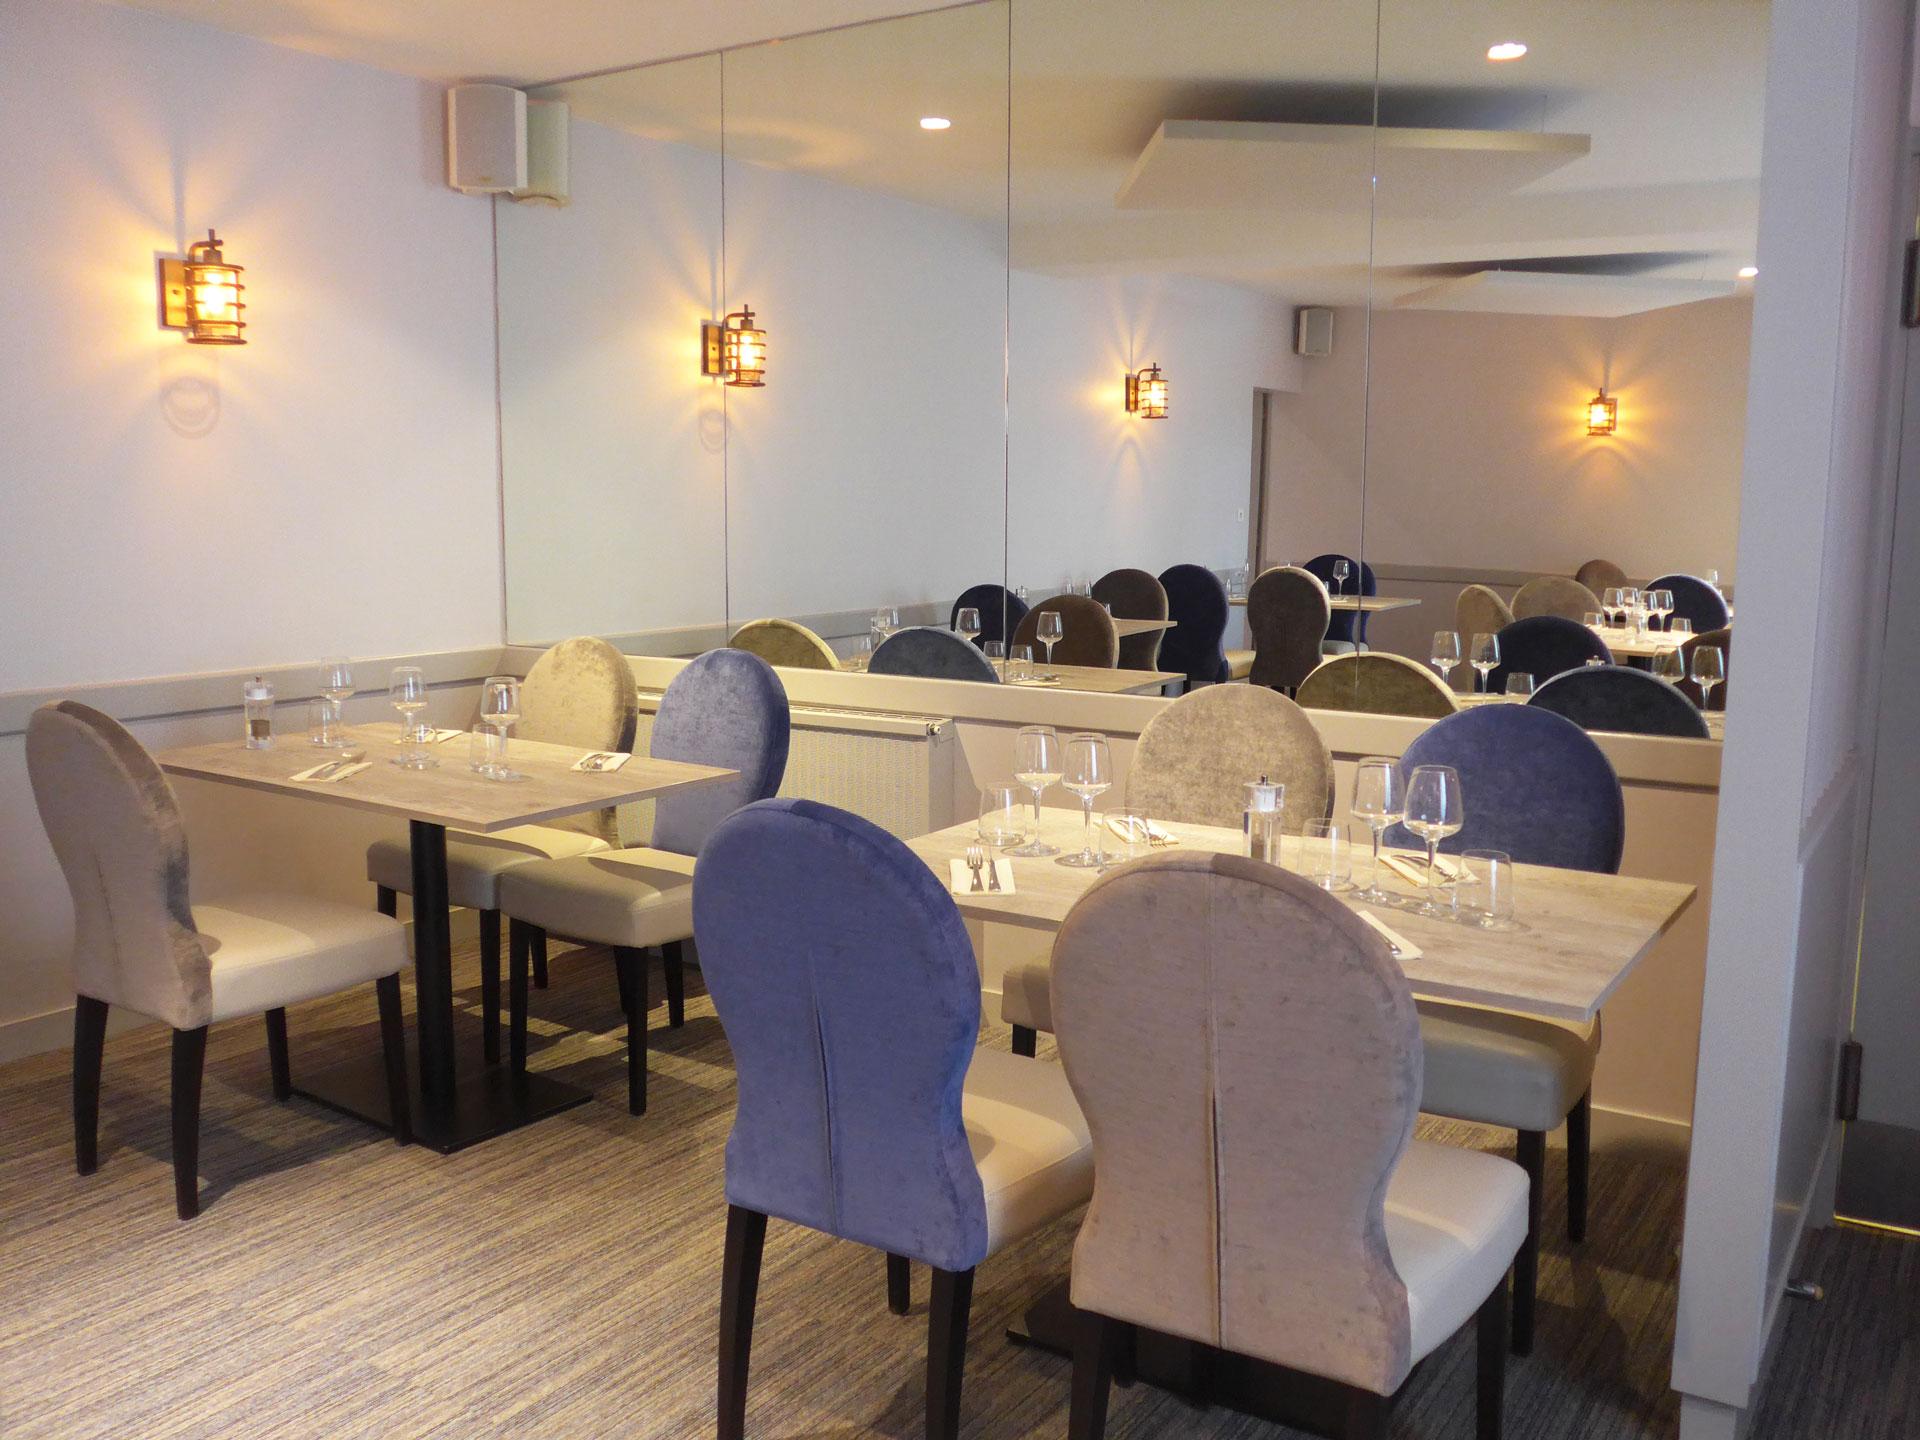 Mobilier Restaurant Les Acacias - Corme Royal